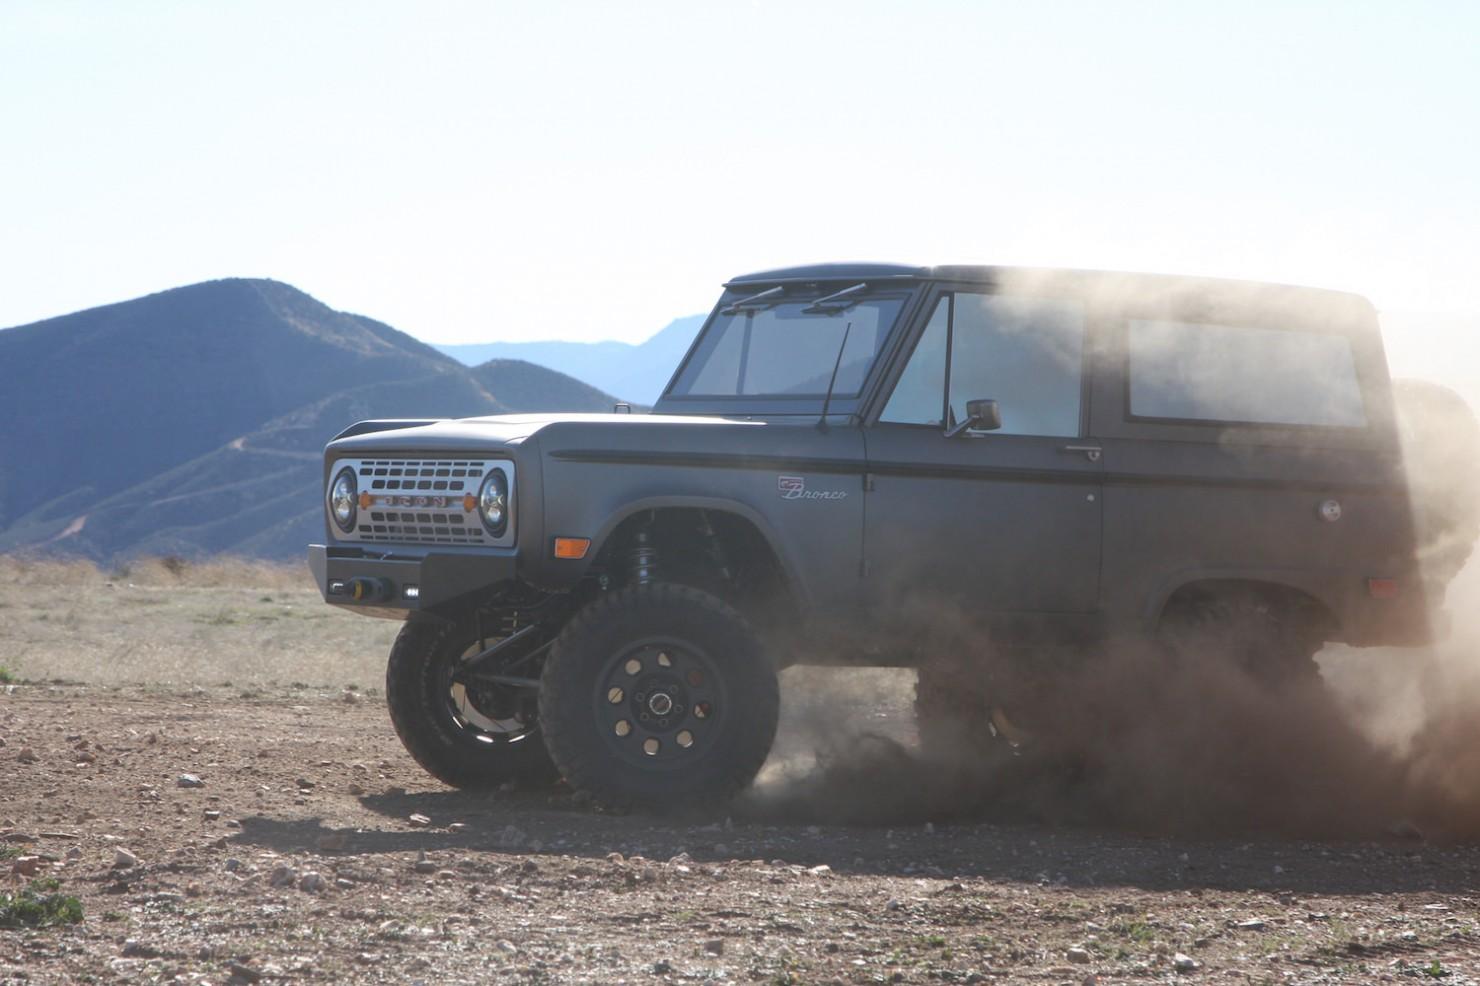 Bronco_Offroad_Profile_Dust